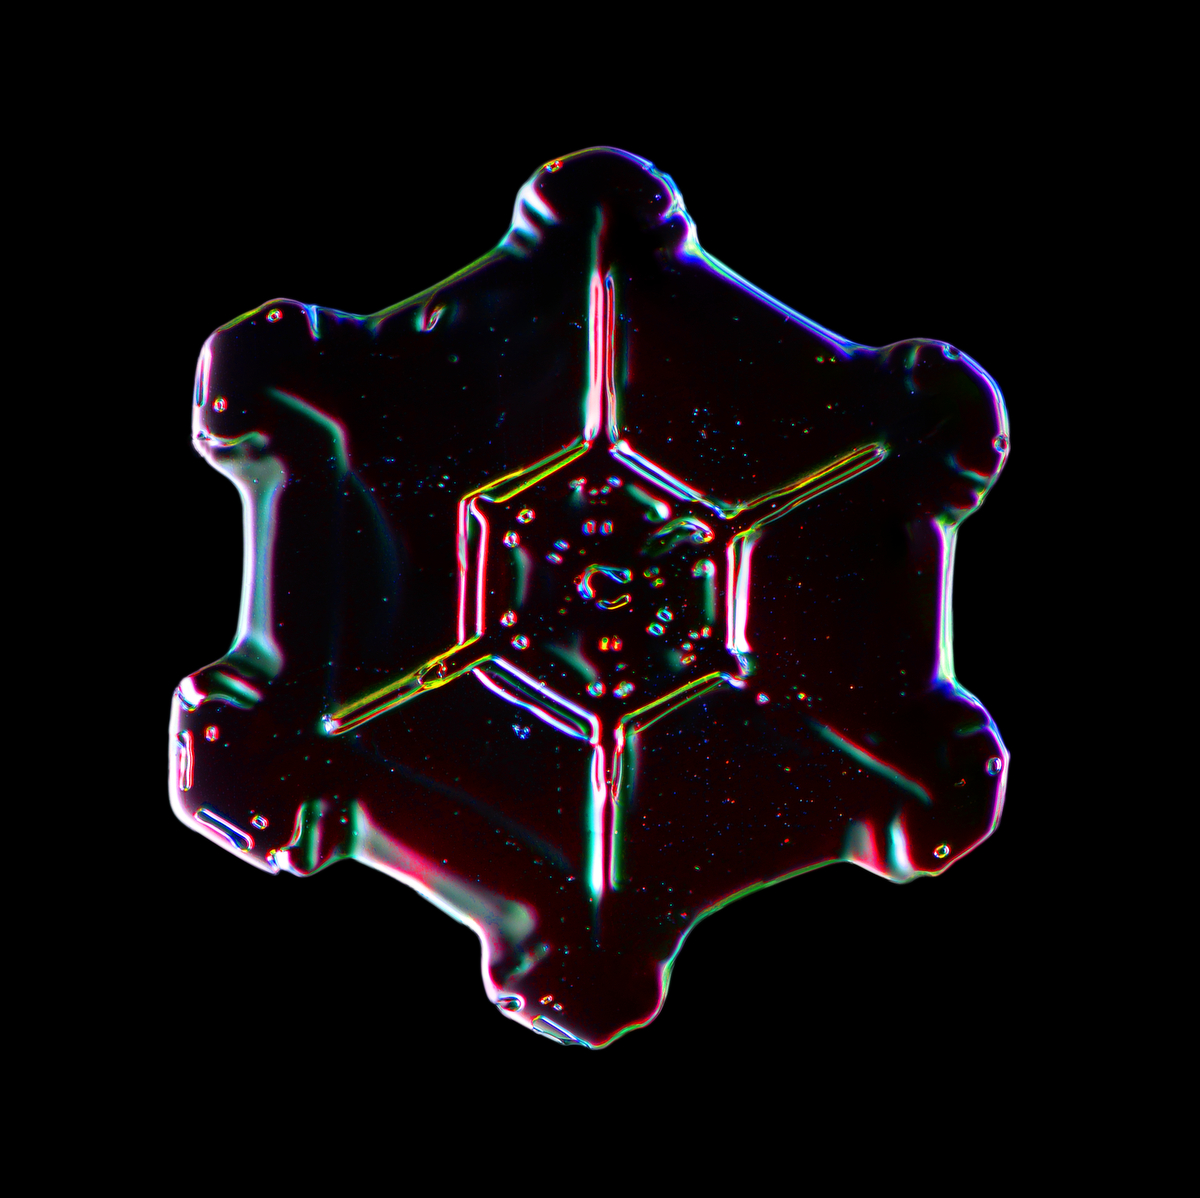 Snowflake 2014.03.02.003